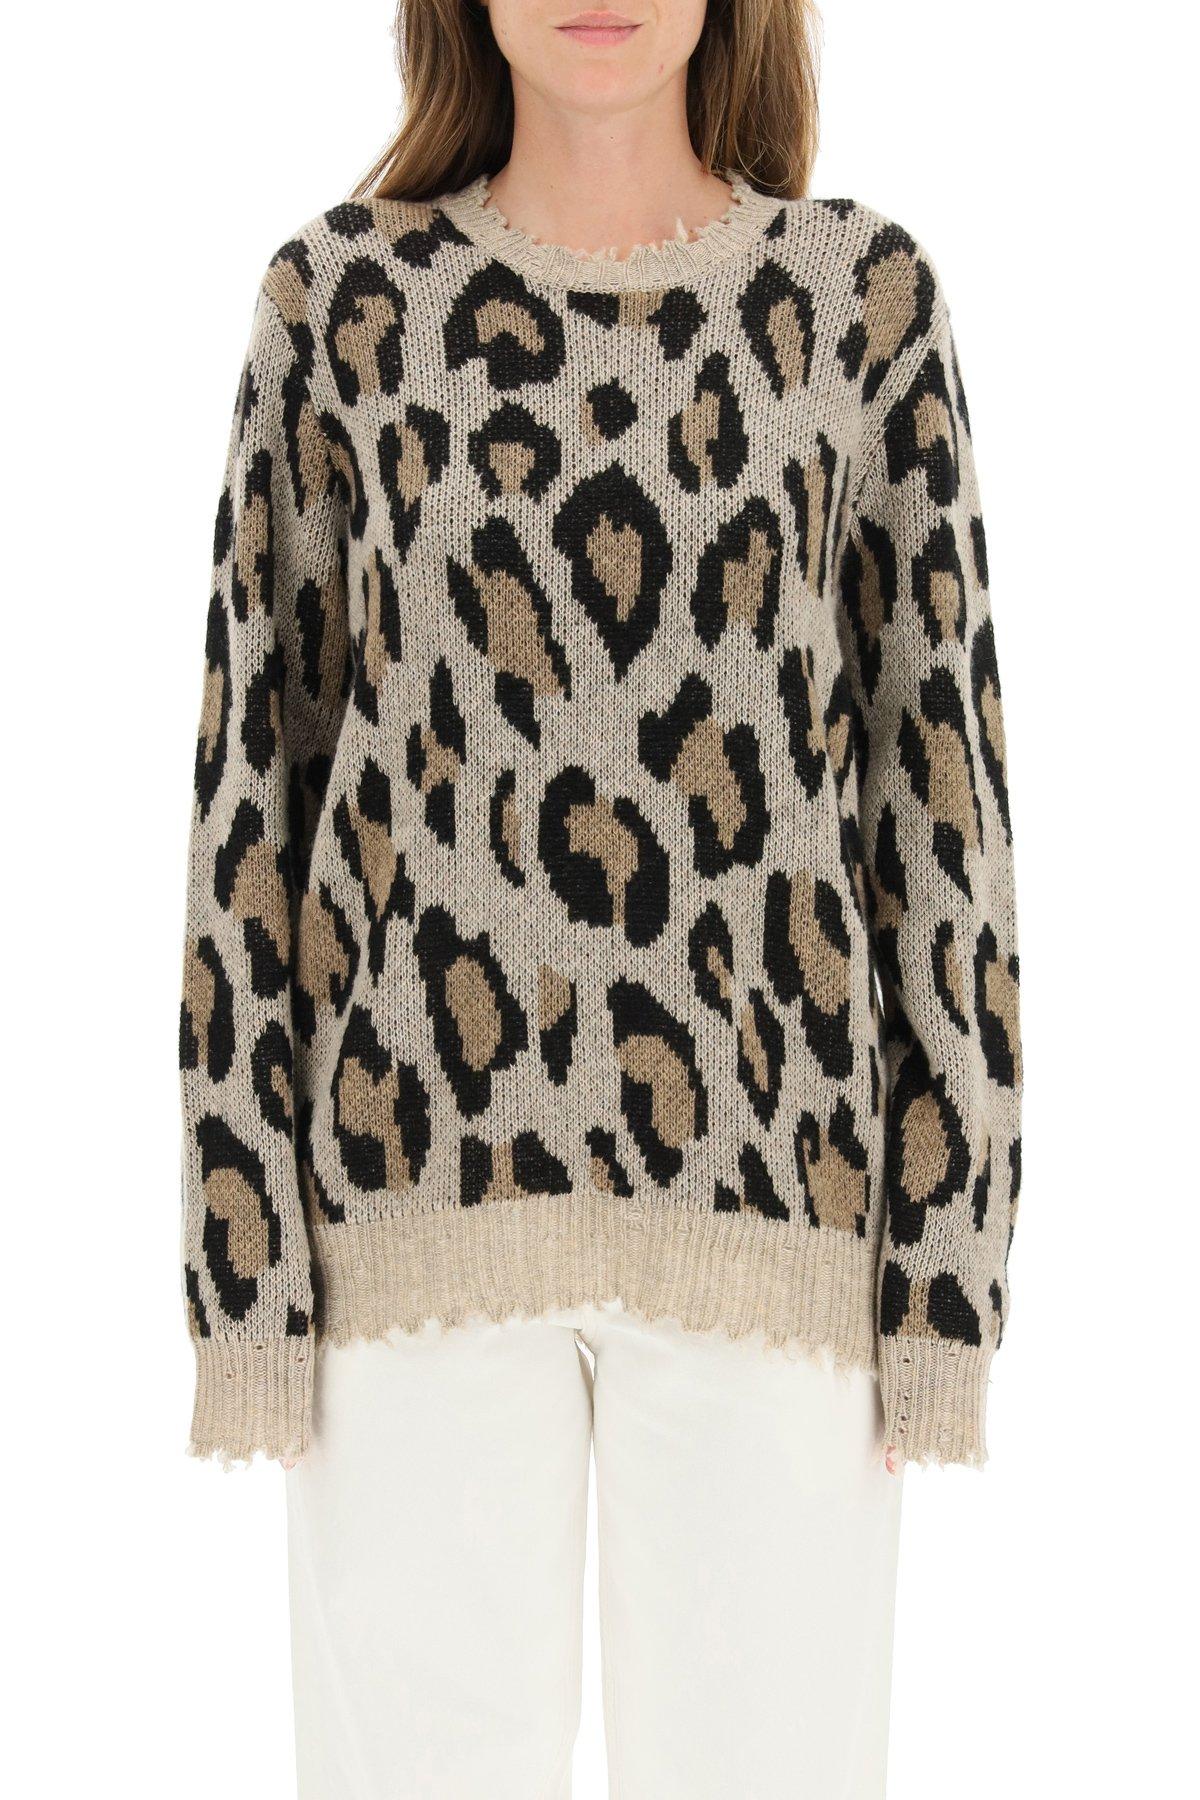 R13 pullover cachemire leopard